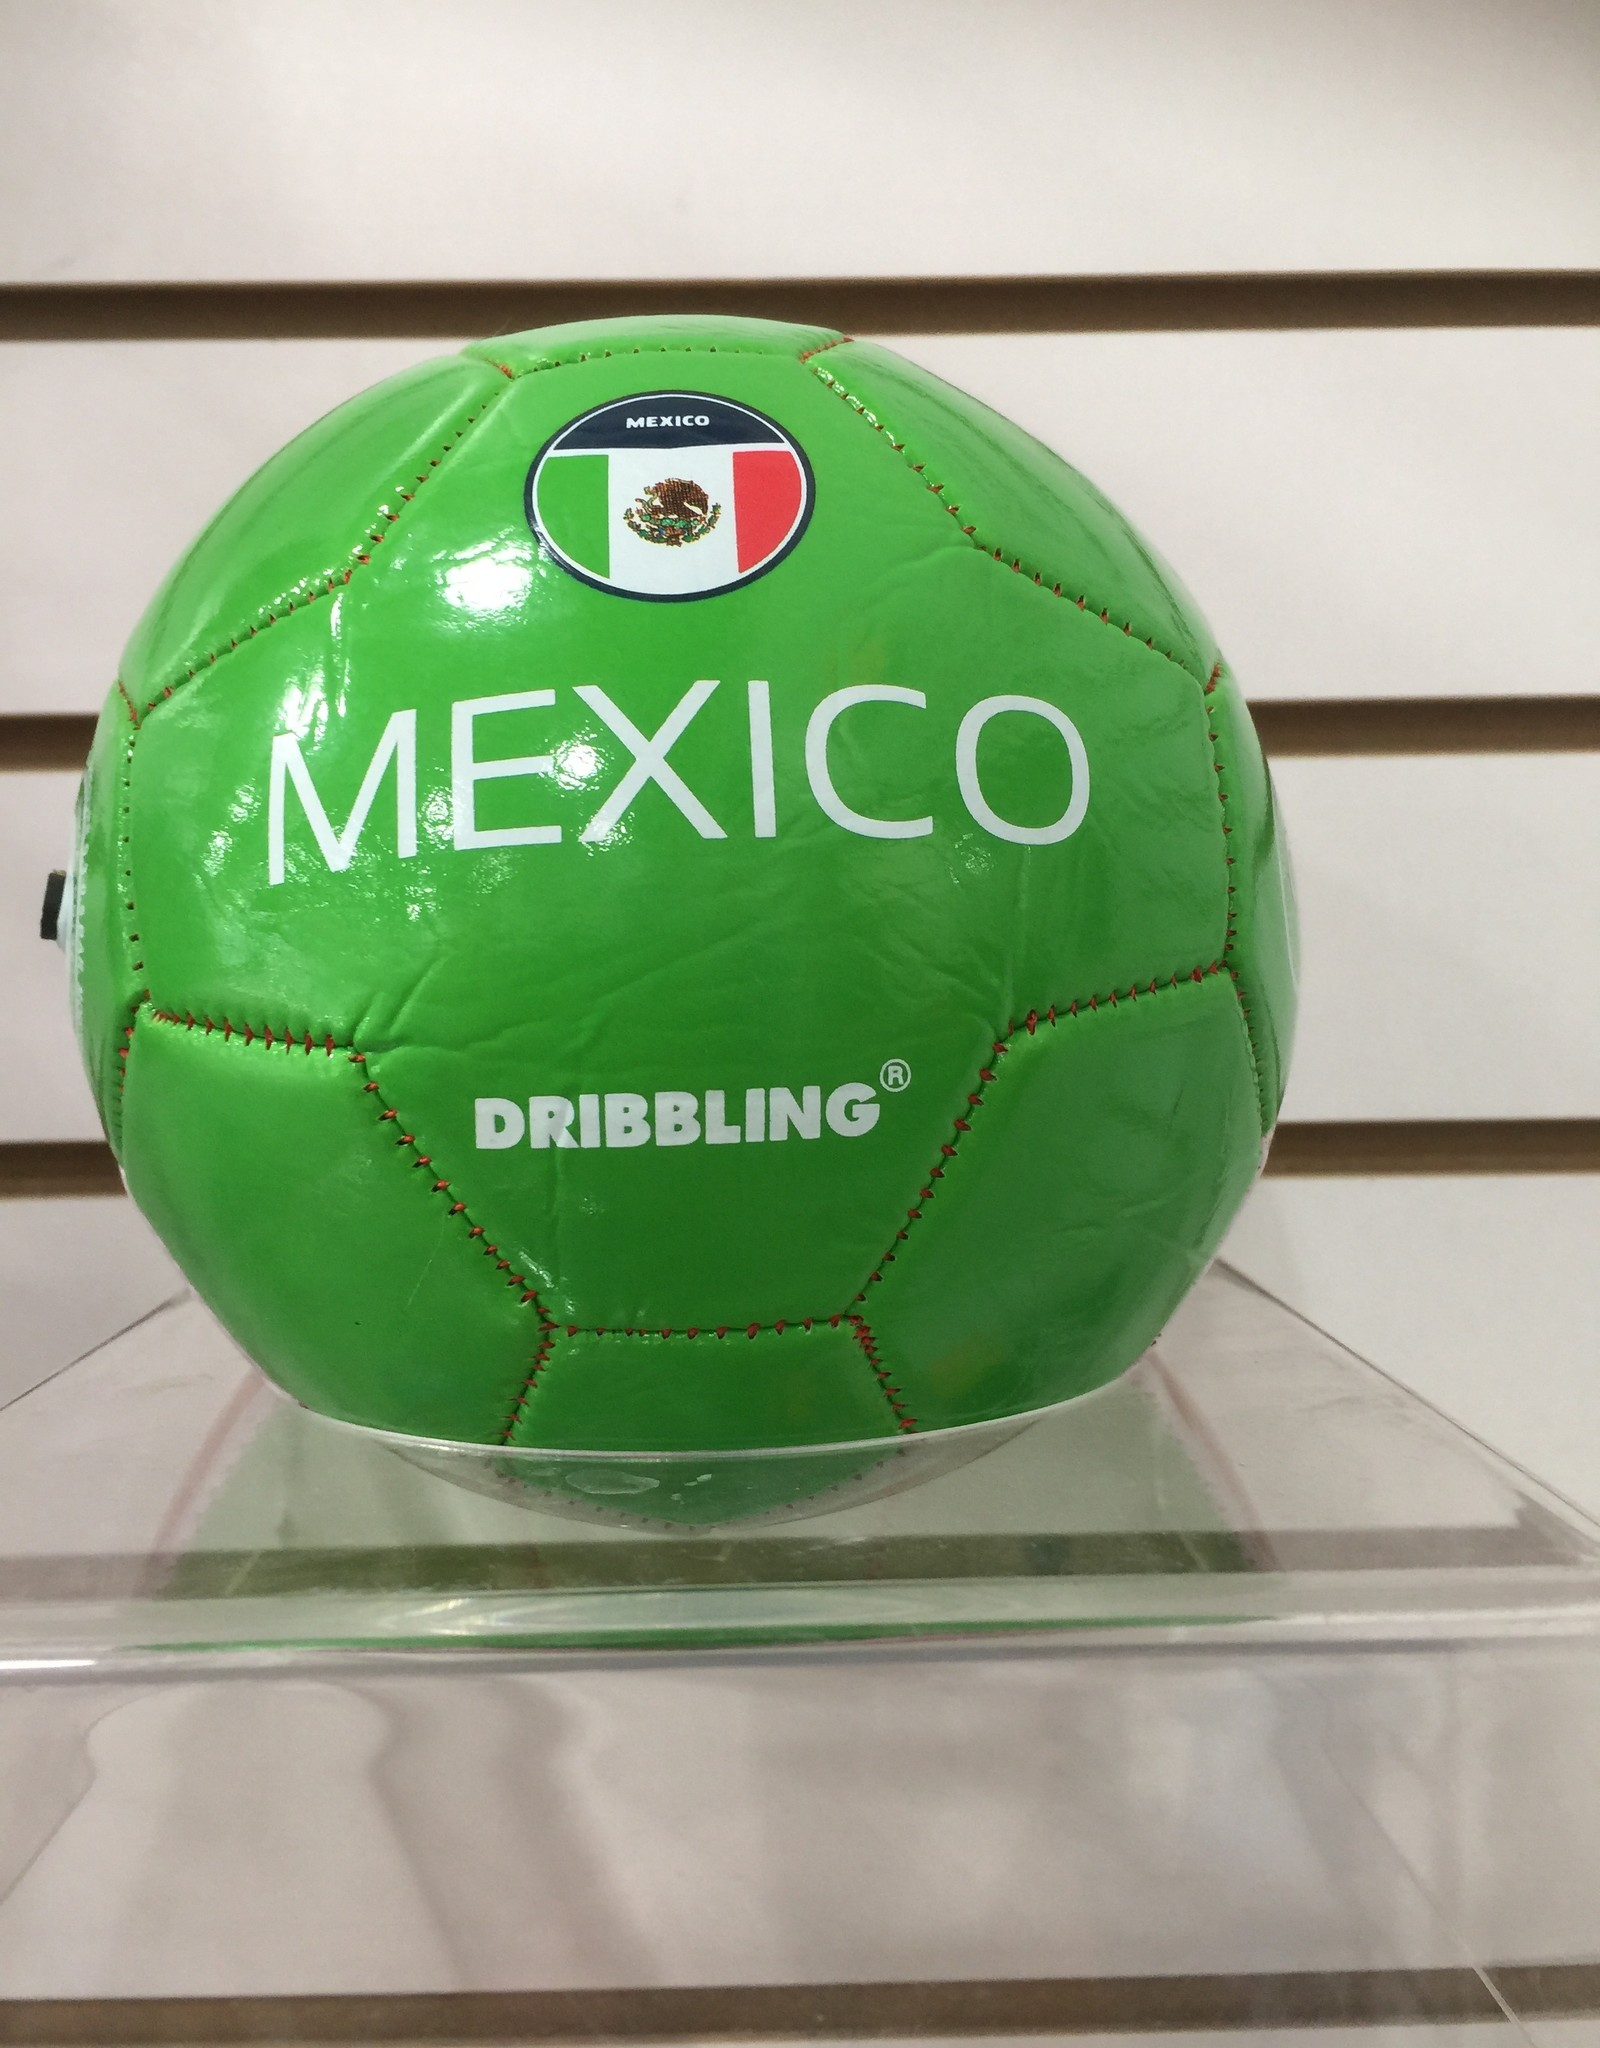 Mexico mini soccer ball